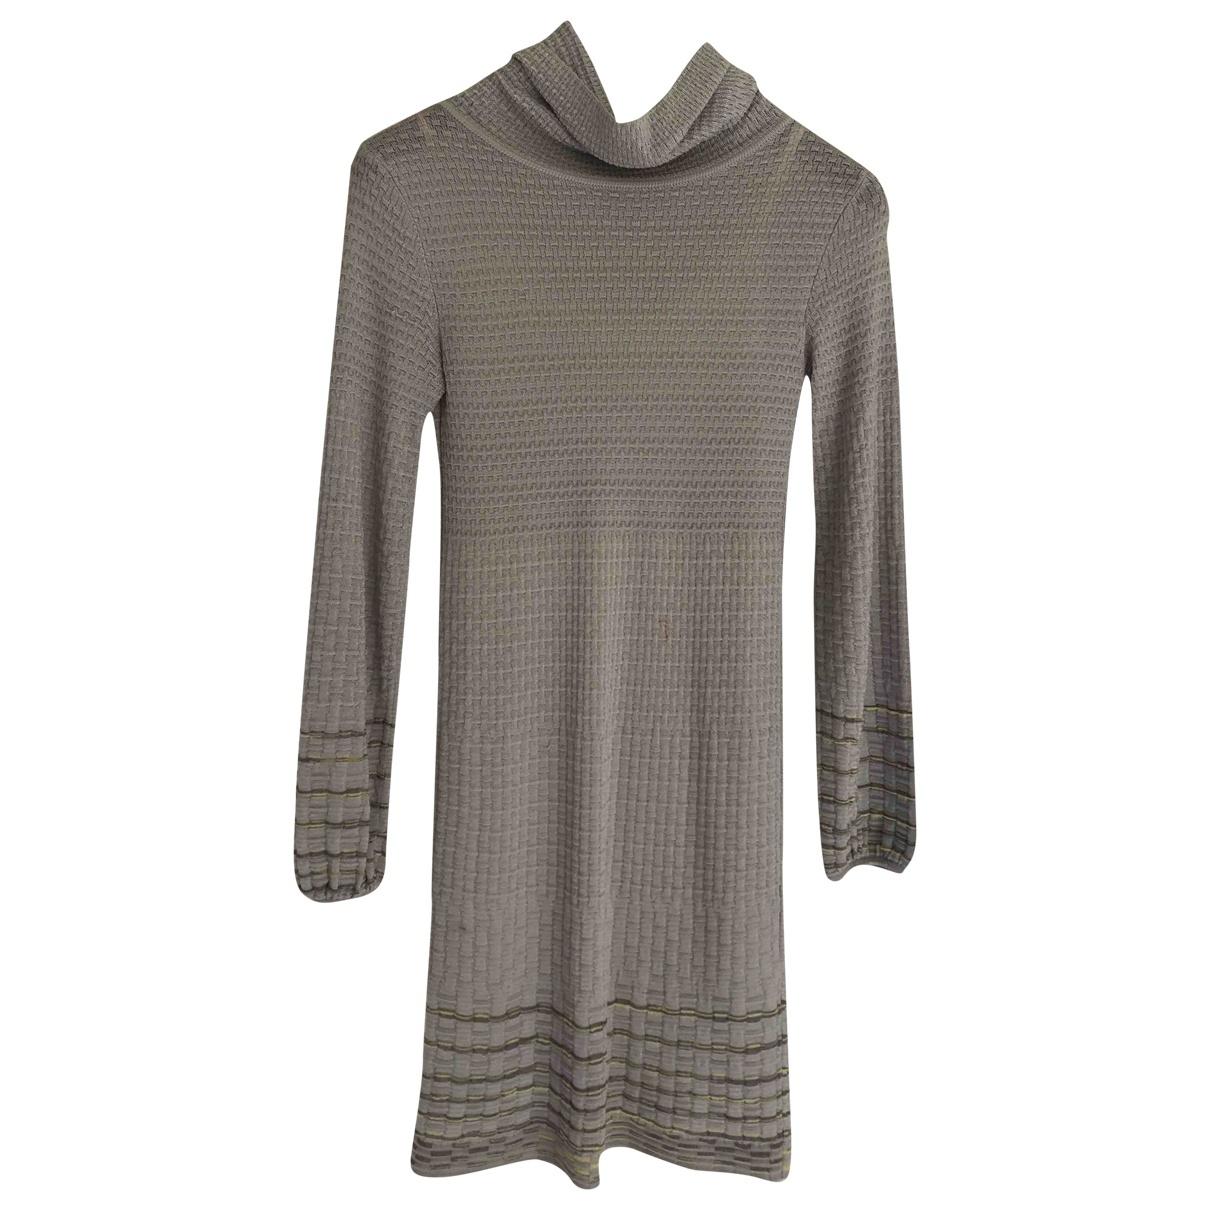 M Missoni \N Silver dress for Women 4 US